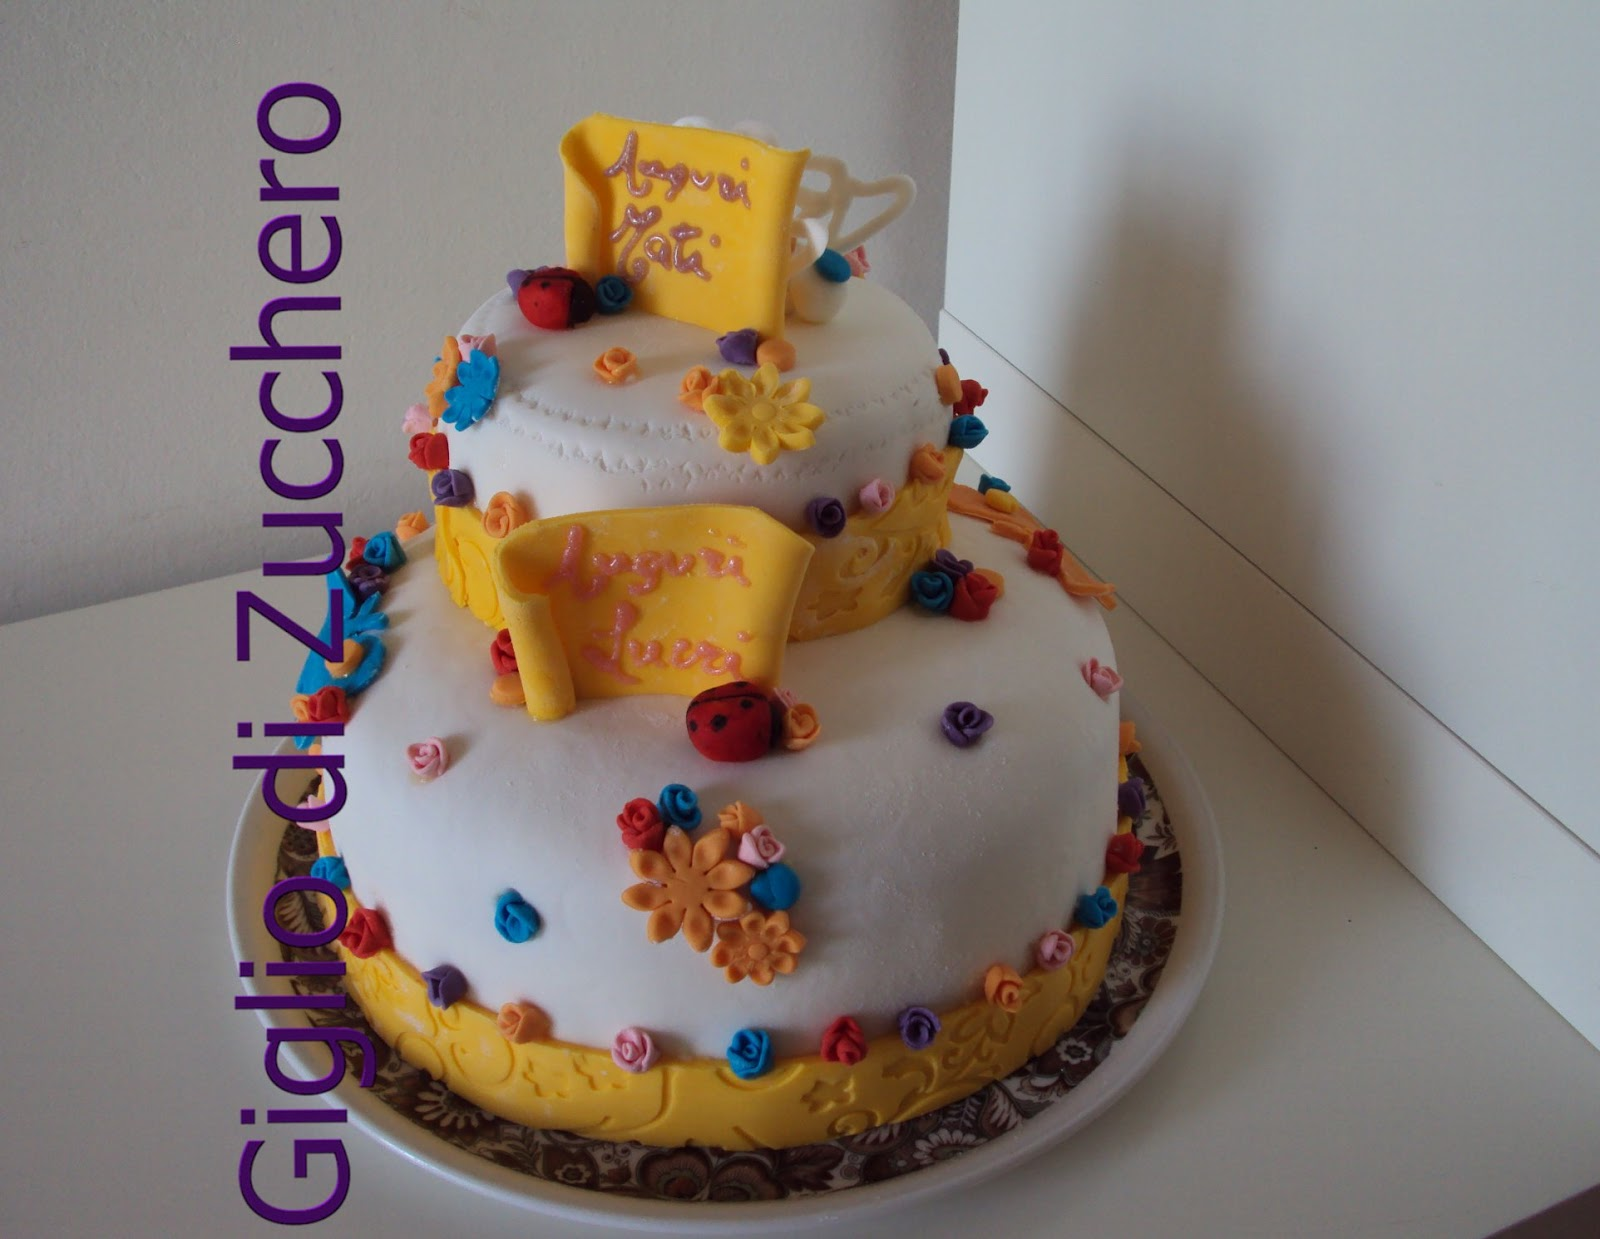 Giglio di zucchero torta a due piani for Piani a due piani